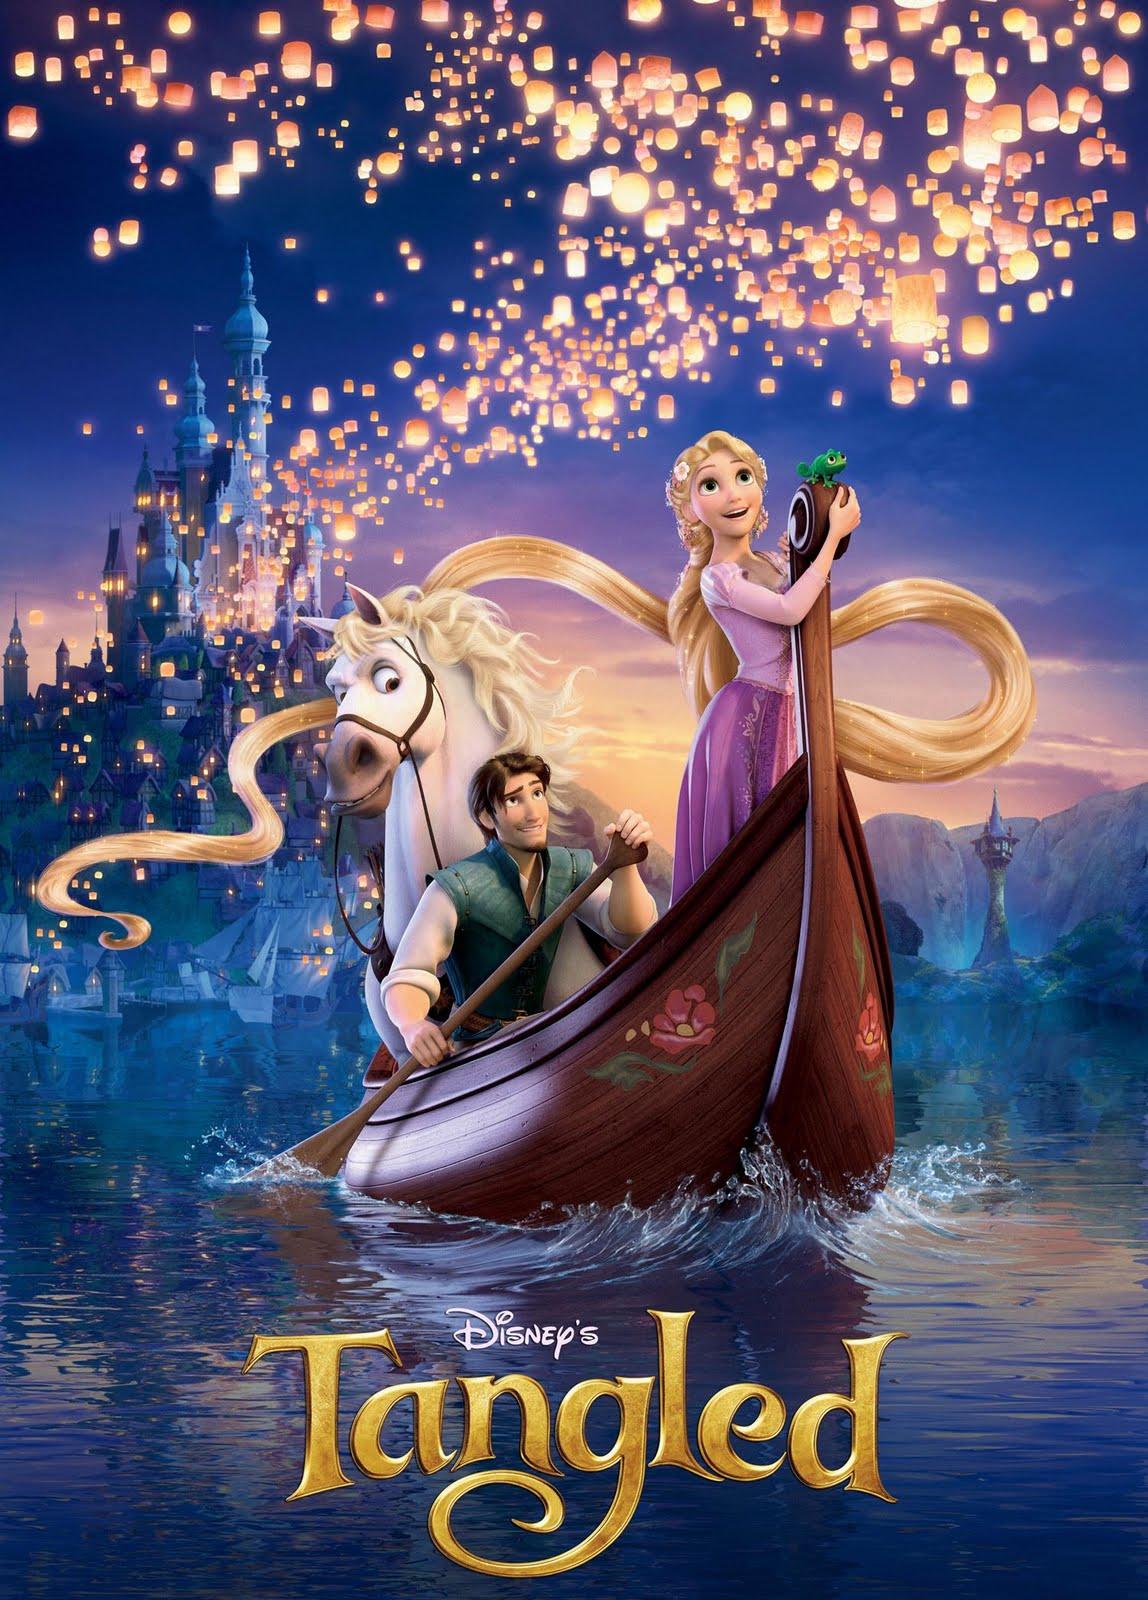 11 disney tangled princess rapunzel wear purple dress